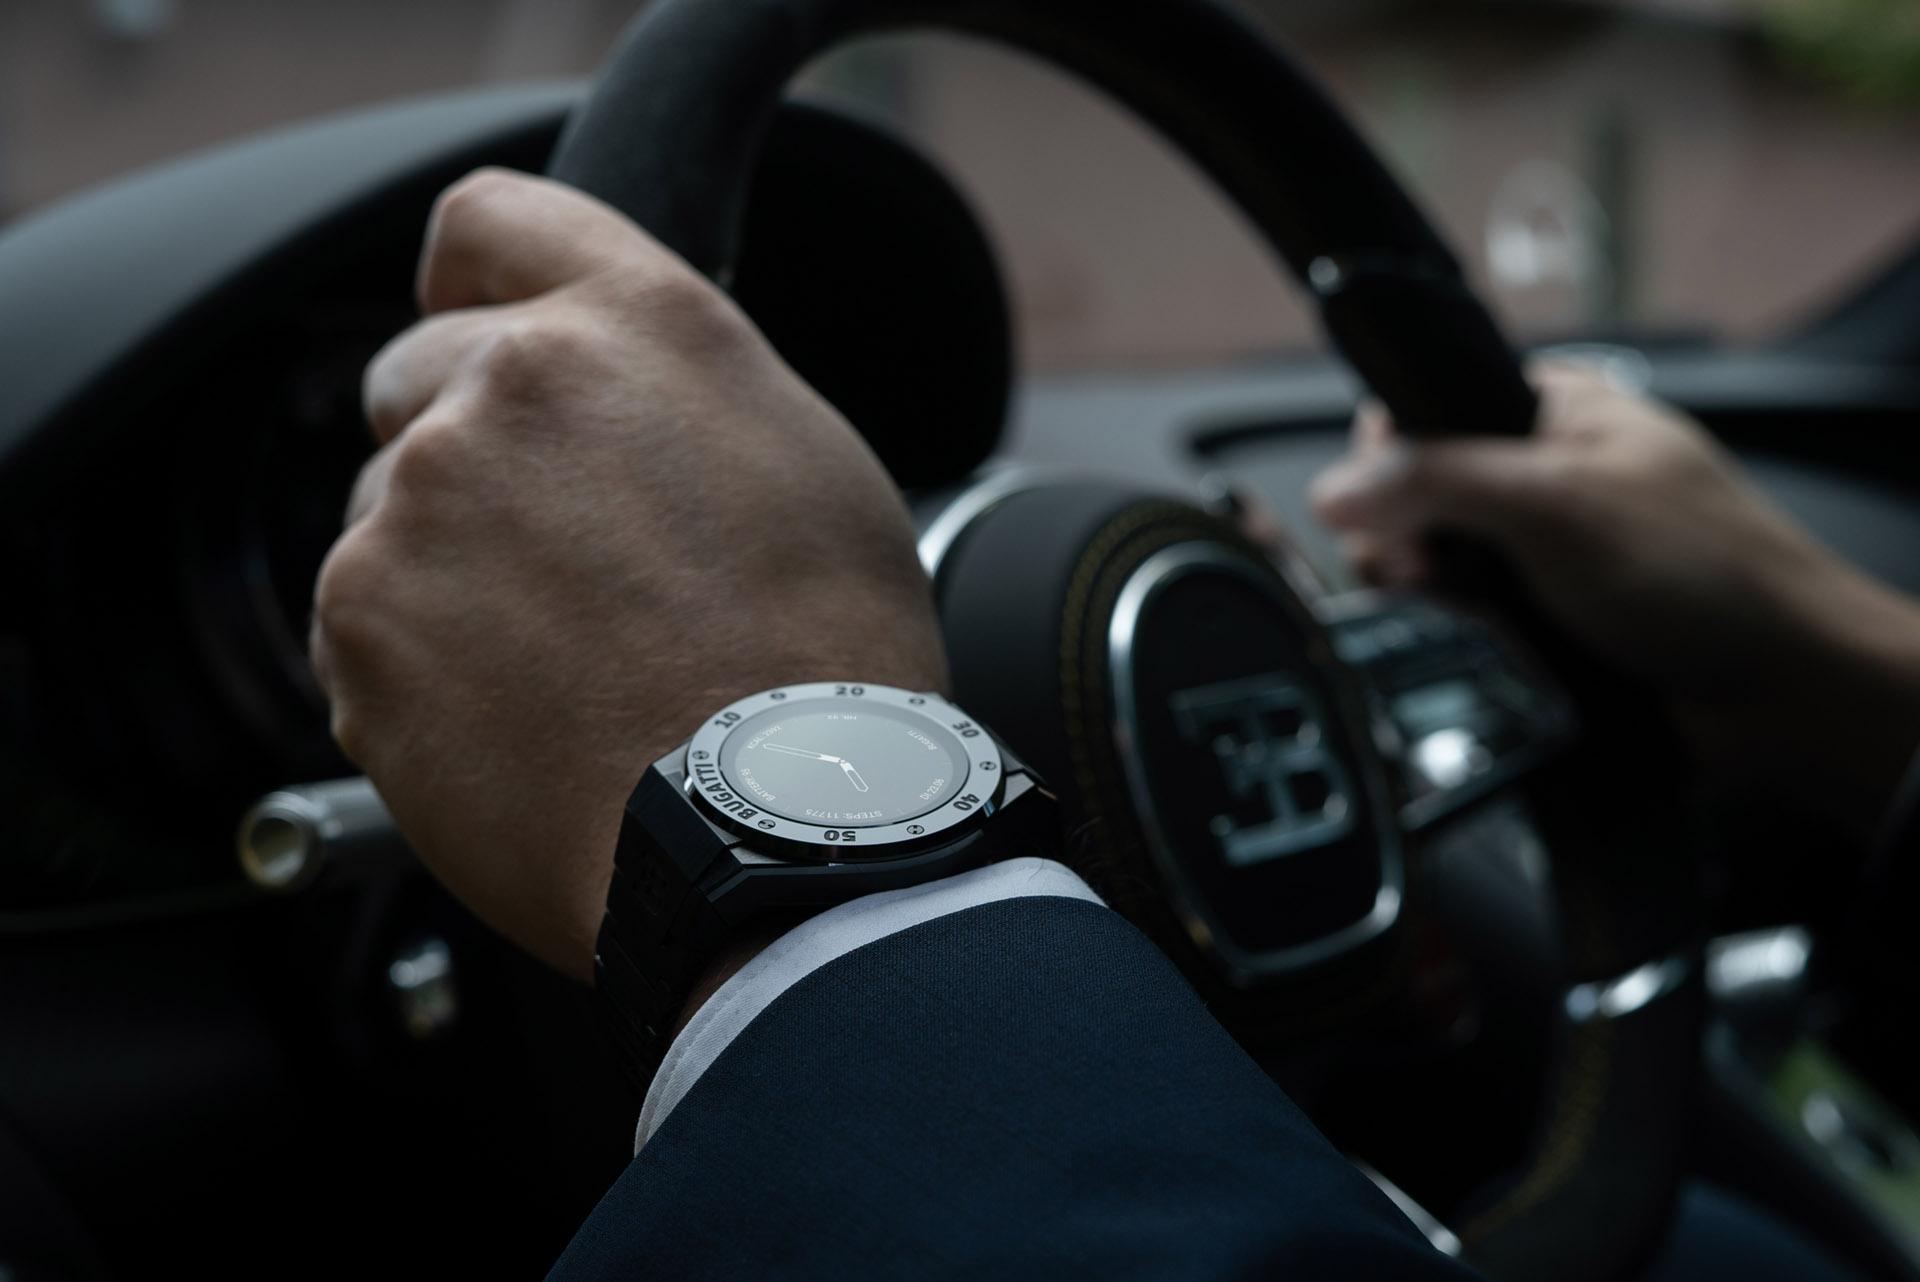 BUGATTI Smartwatch by VIITA